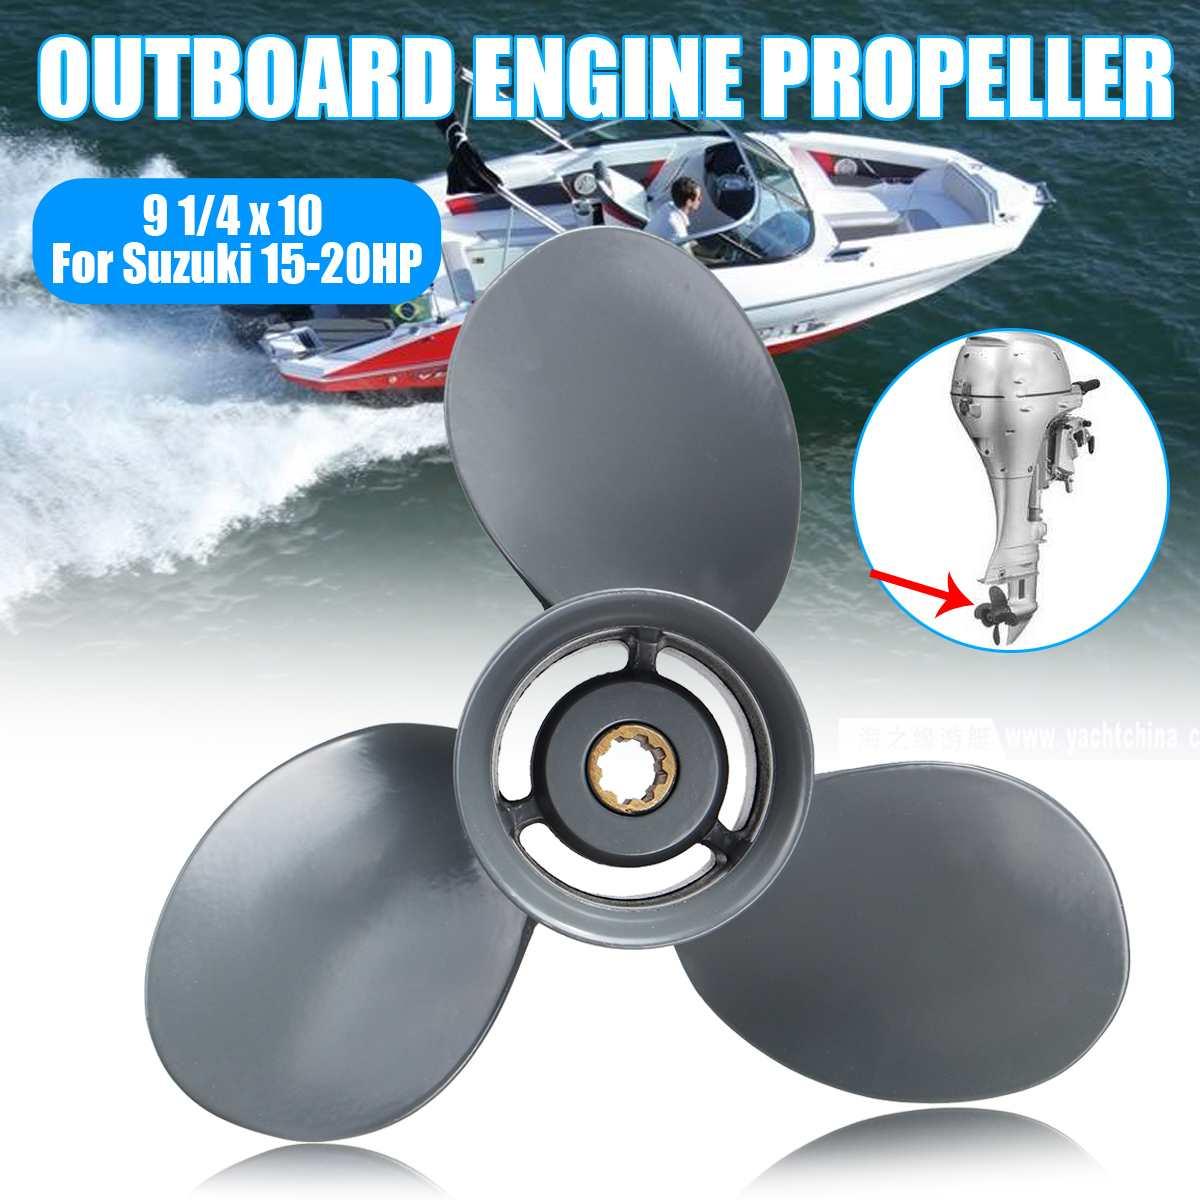 Marine Boat Engine Propeller 9 1/4 x 10 Outboard Engine Propeller For Honda 15 20HP